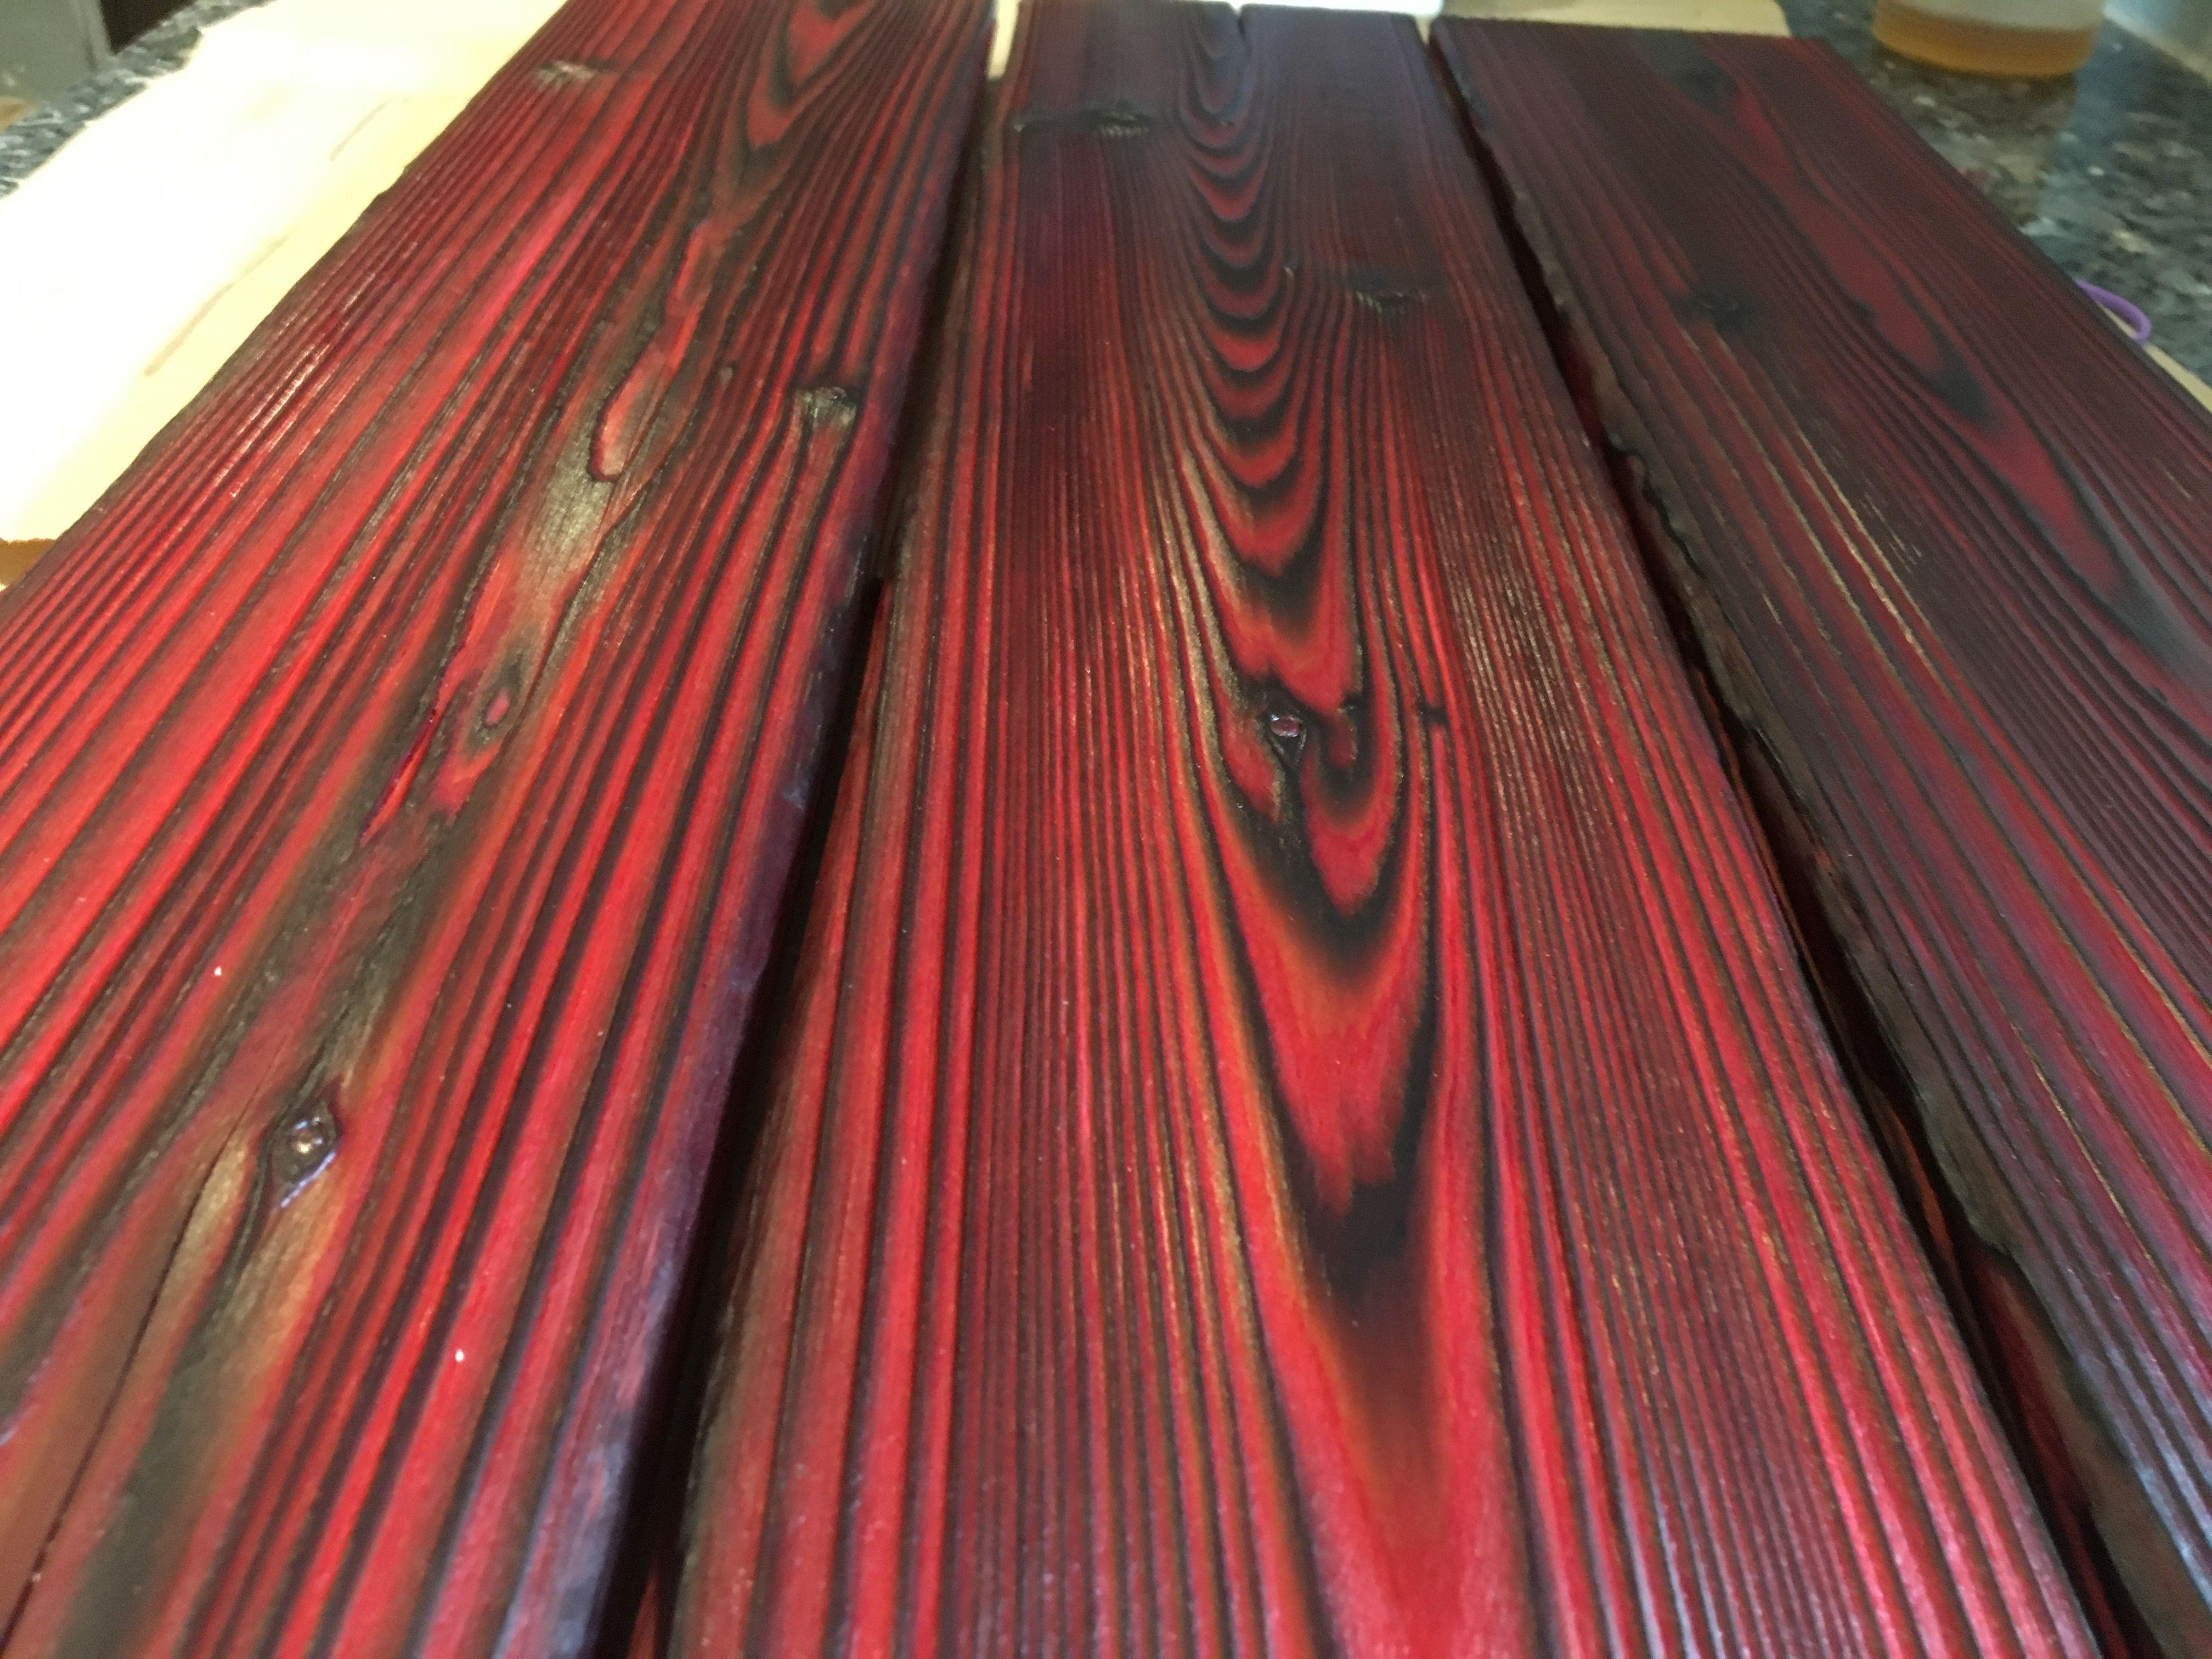 Shou Sugi Ban Wall Panels Burnt Wood Wall Panels Bright Red 24 Long X 5 25 High Each Shousugiban Wallpanel Red Wood Stain Wood Panel Walls Staining Wood